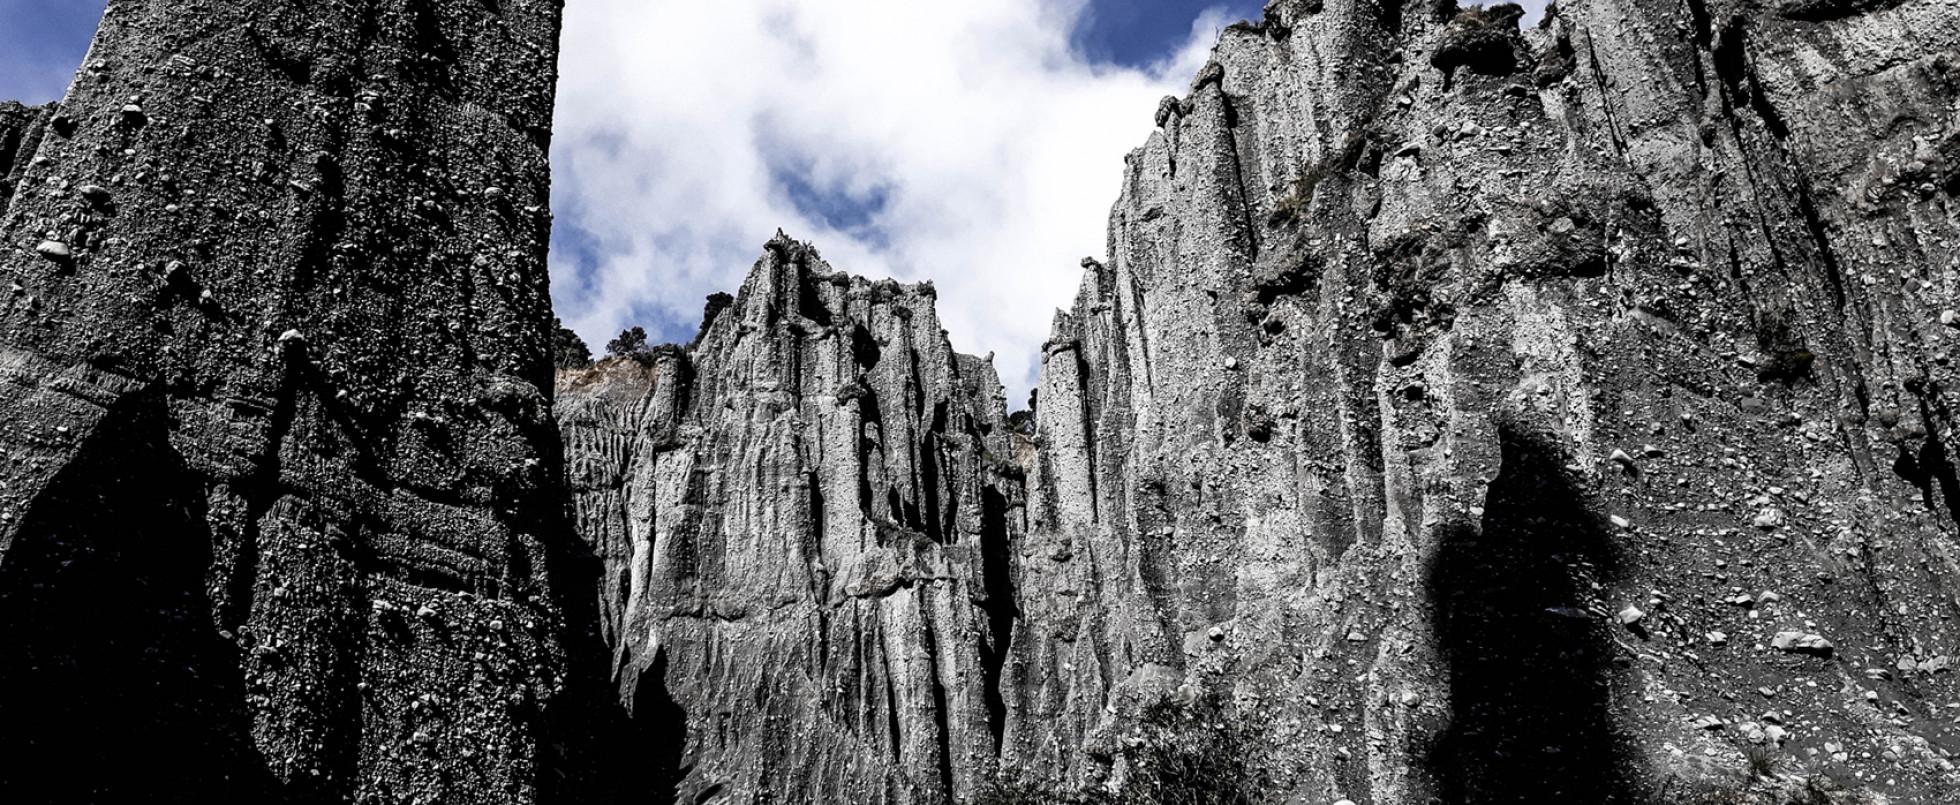 Putangirua Pinnacles: The Dimholt Road